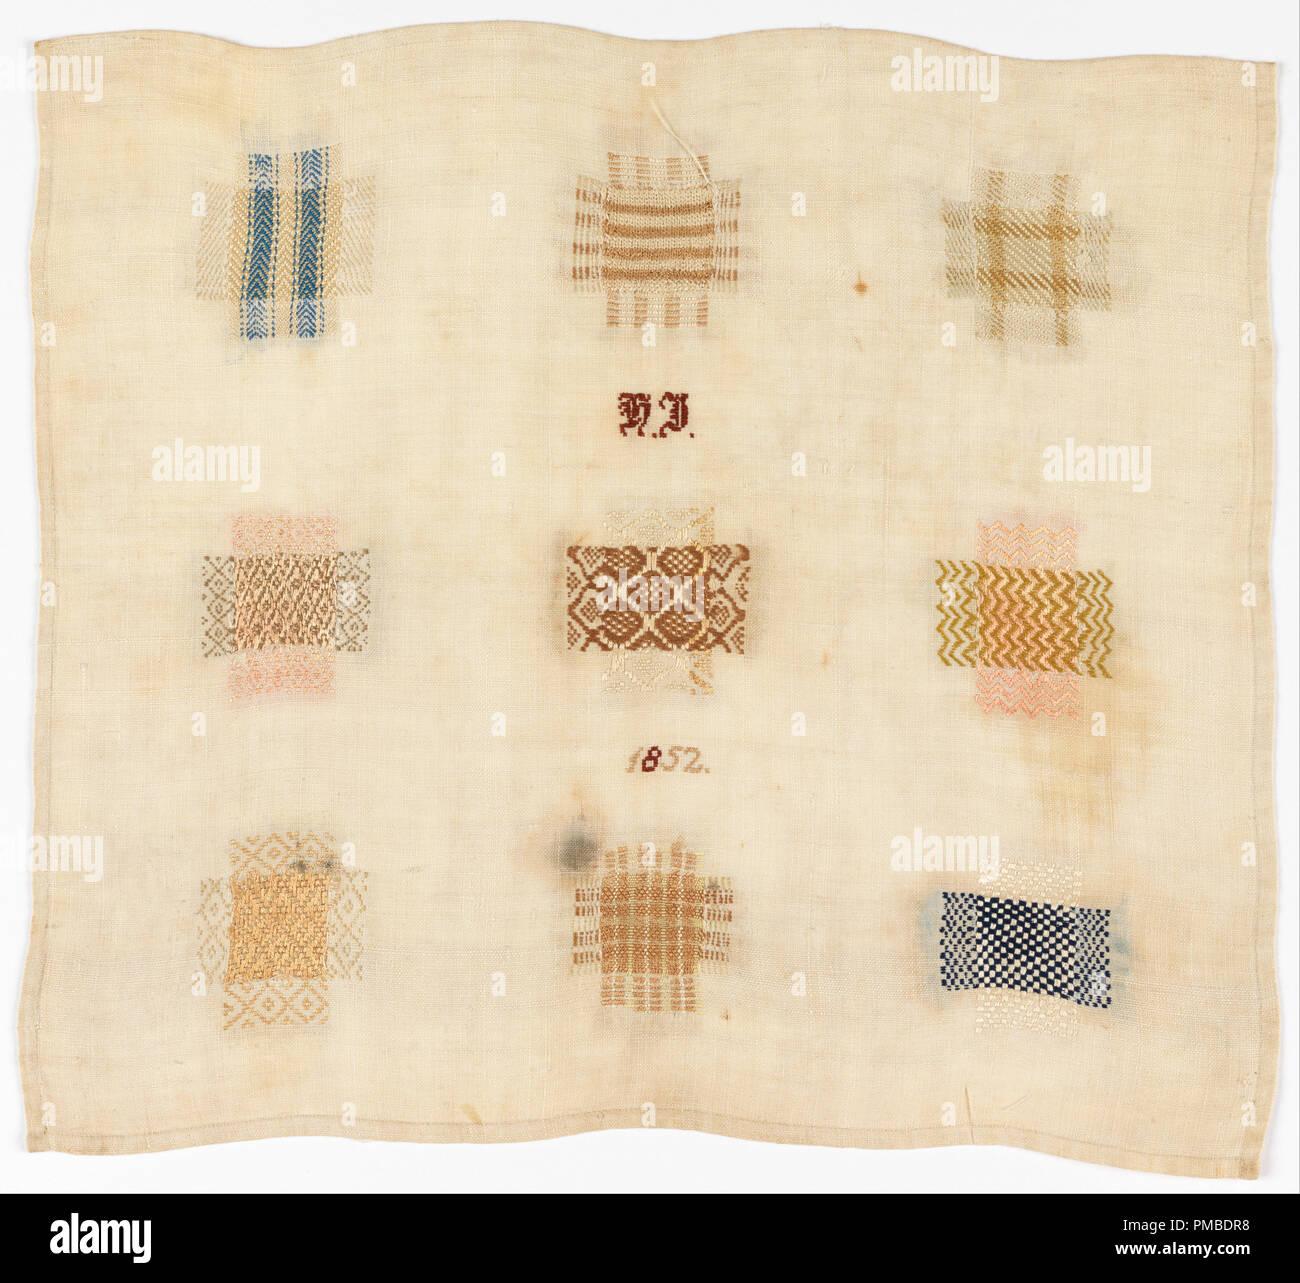 Zurcir sampler. Fecha/período: 1852. Zurcir sampler. Medio: seda ...